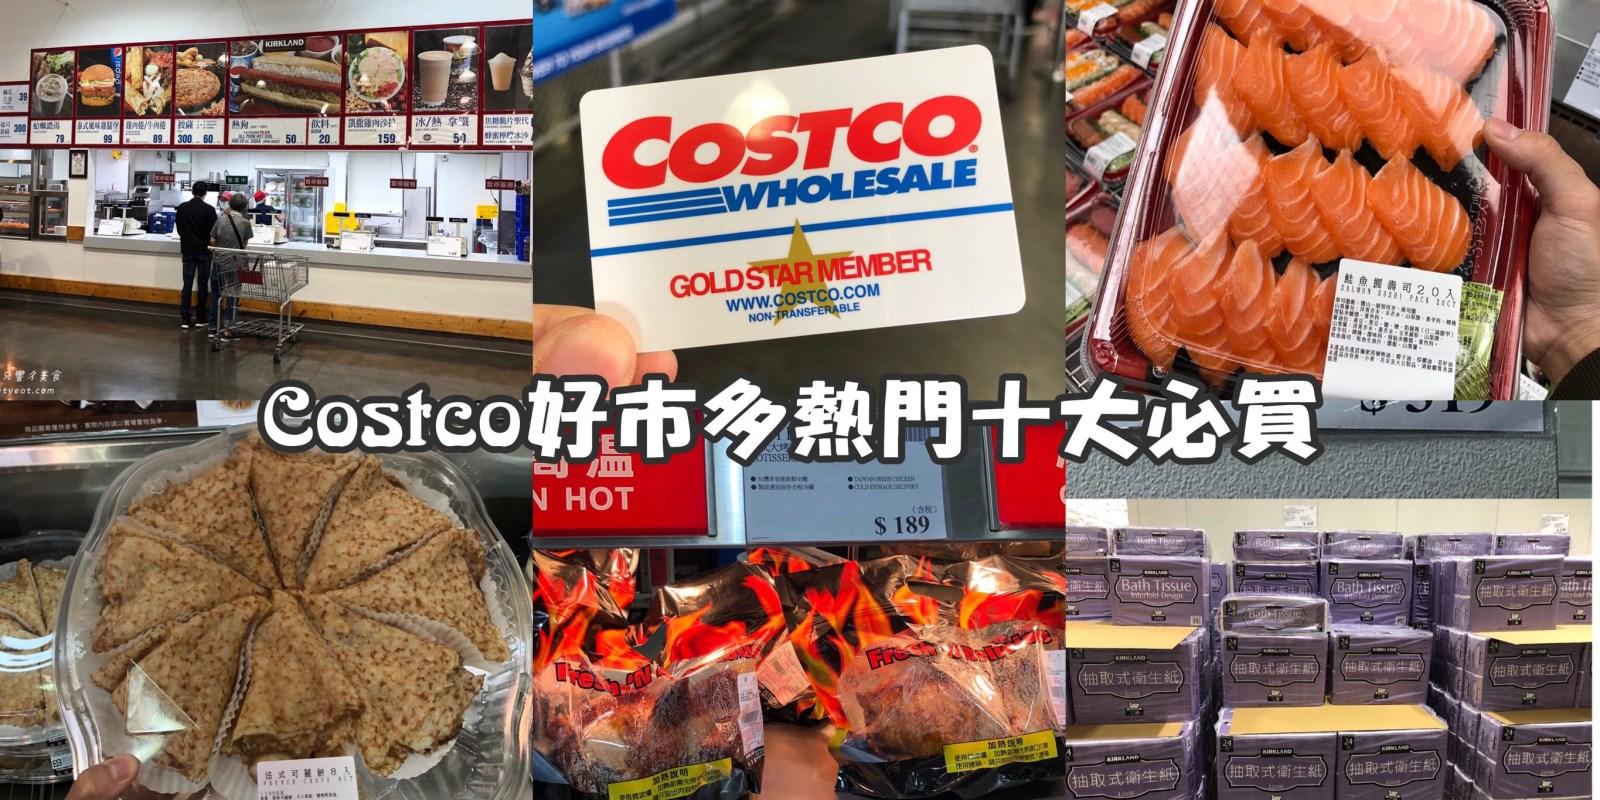 【Costco好市多必買】2021熱門必買推薦名單 哪些熱門商品你非買不可?(持續更新中)